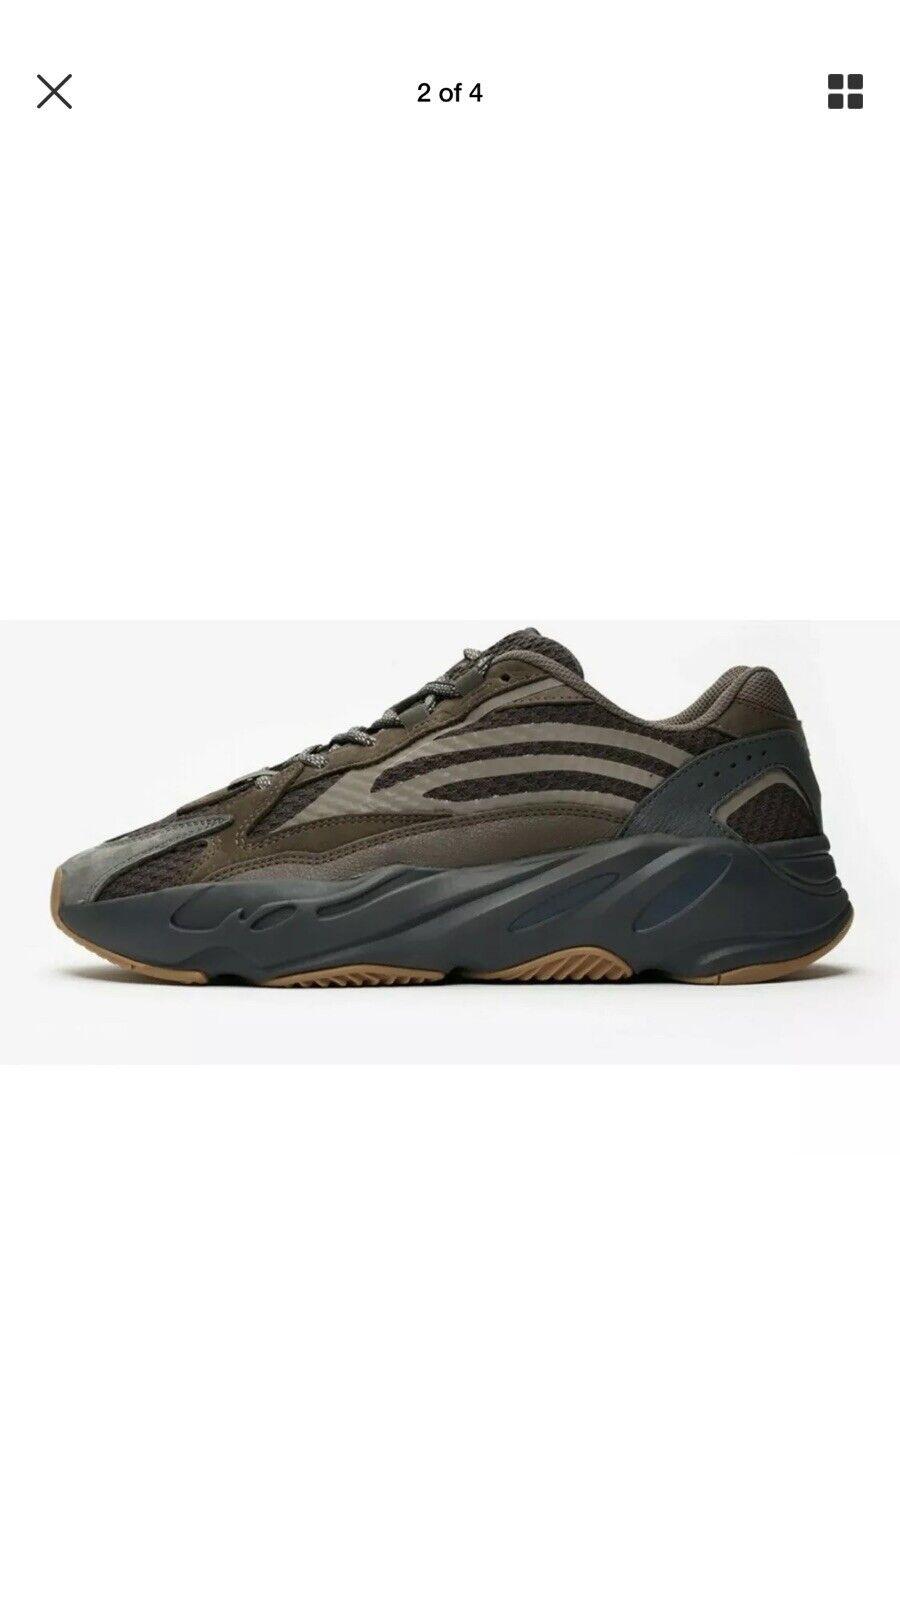 Adidas Yeezy Boost 700 V2 Geode Men's Size 7 EG6860 Deadstock 100% Authentic